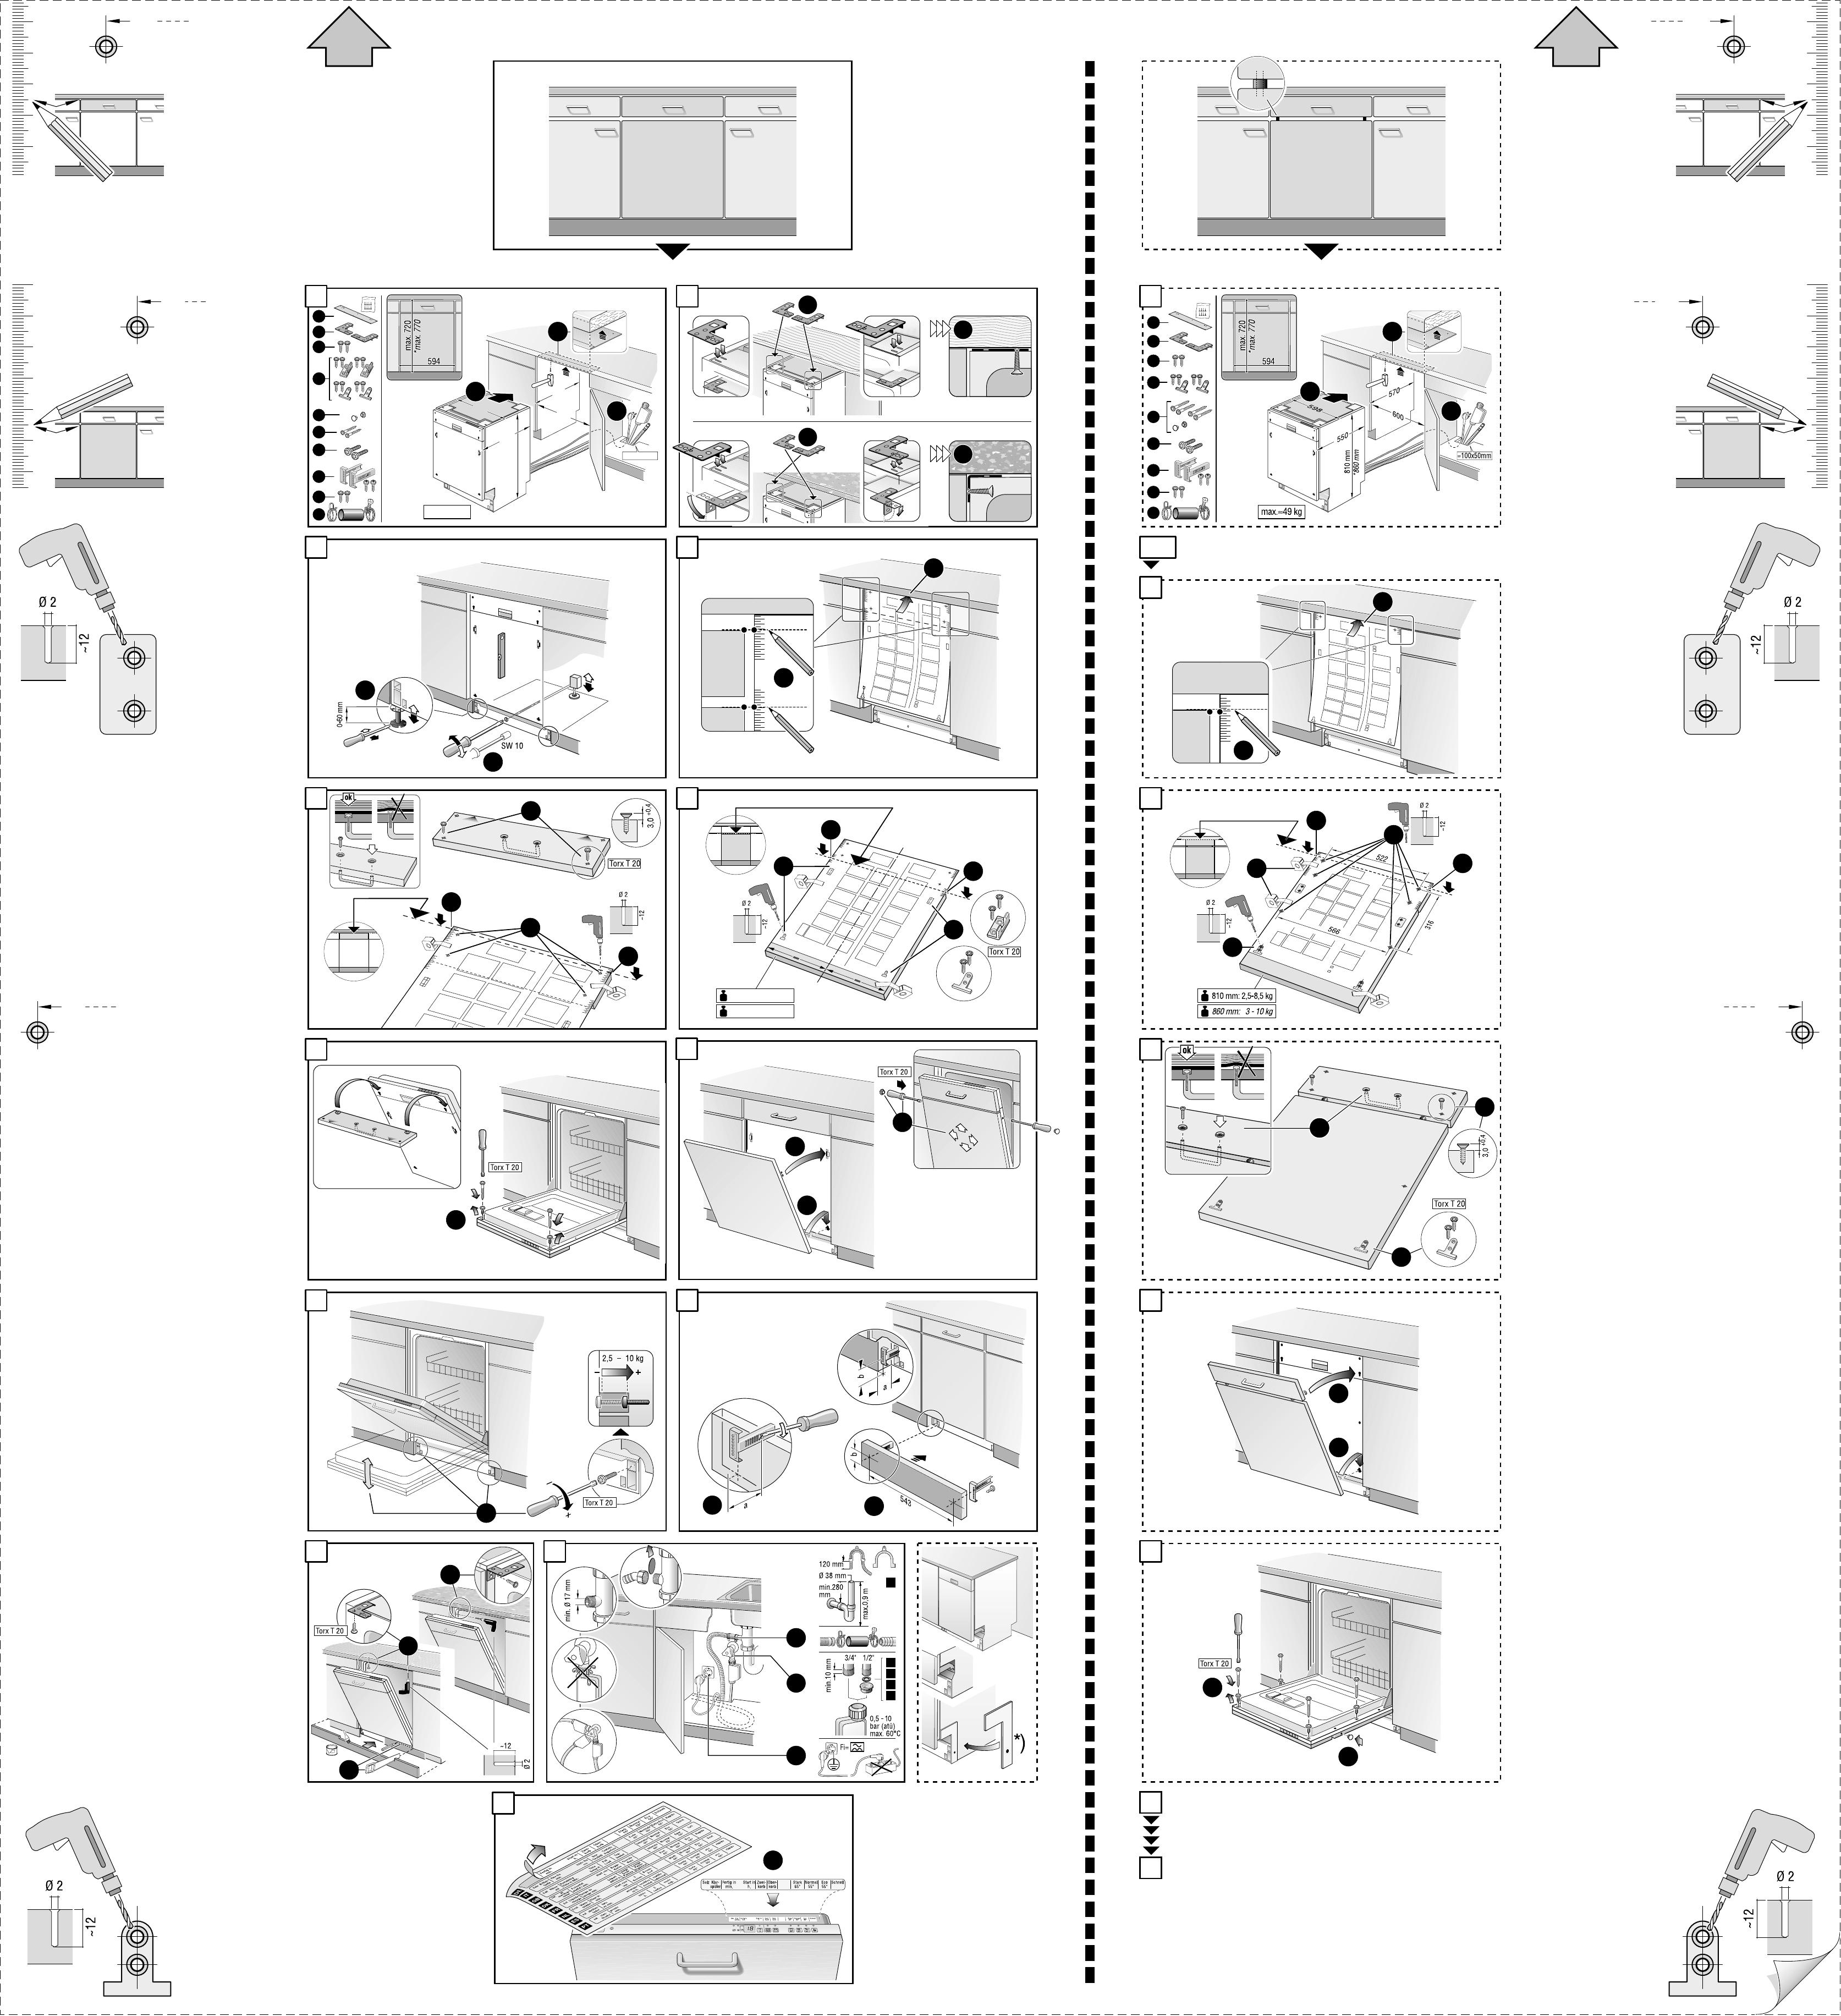 Bekend Handleiding Siemens SE64A560 (pagina 1 van 2) (Nederlands) VA04